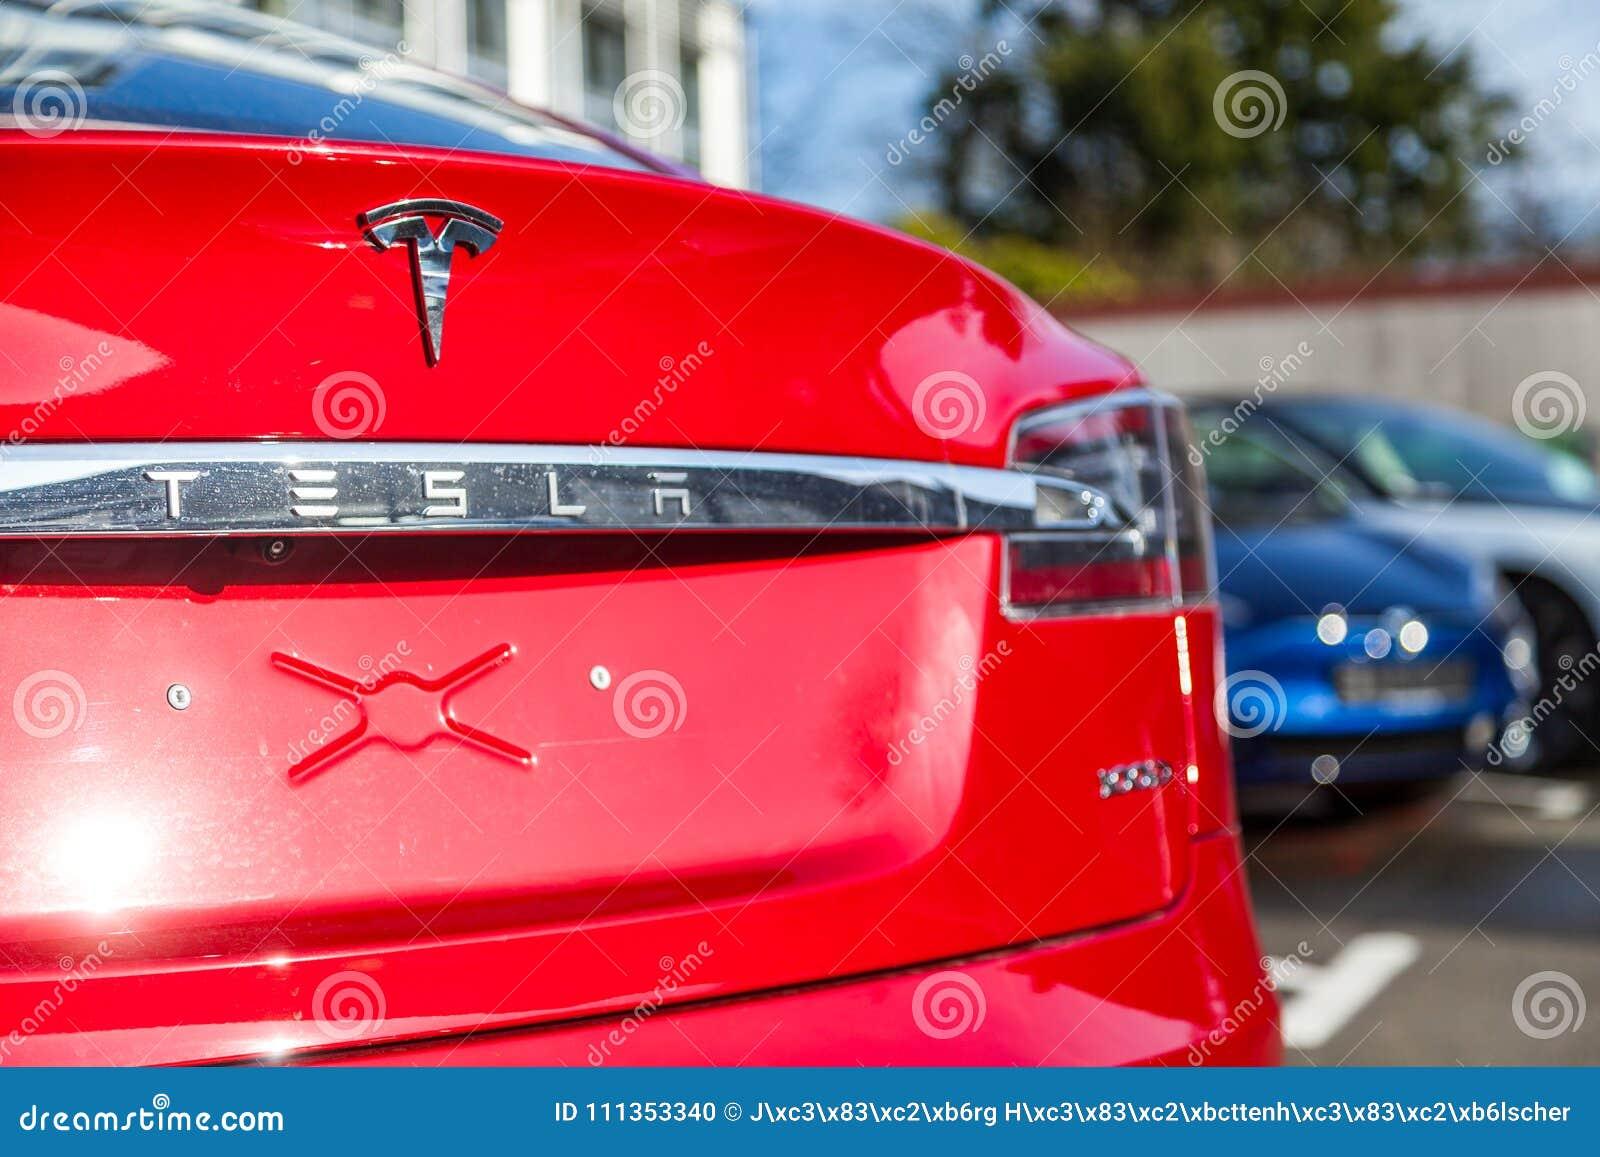 Логотип Tesla на автомобиле Tesla